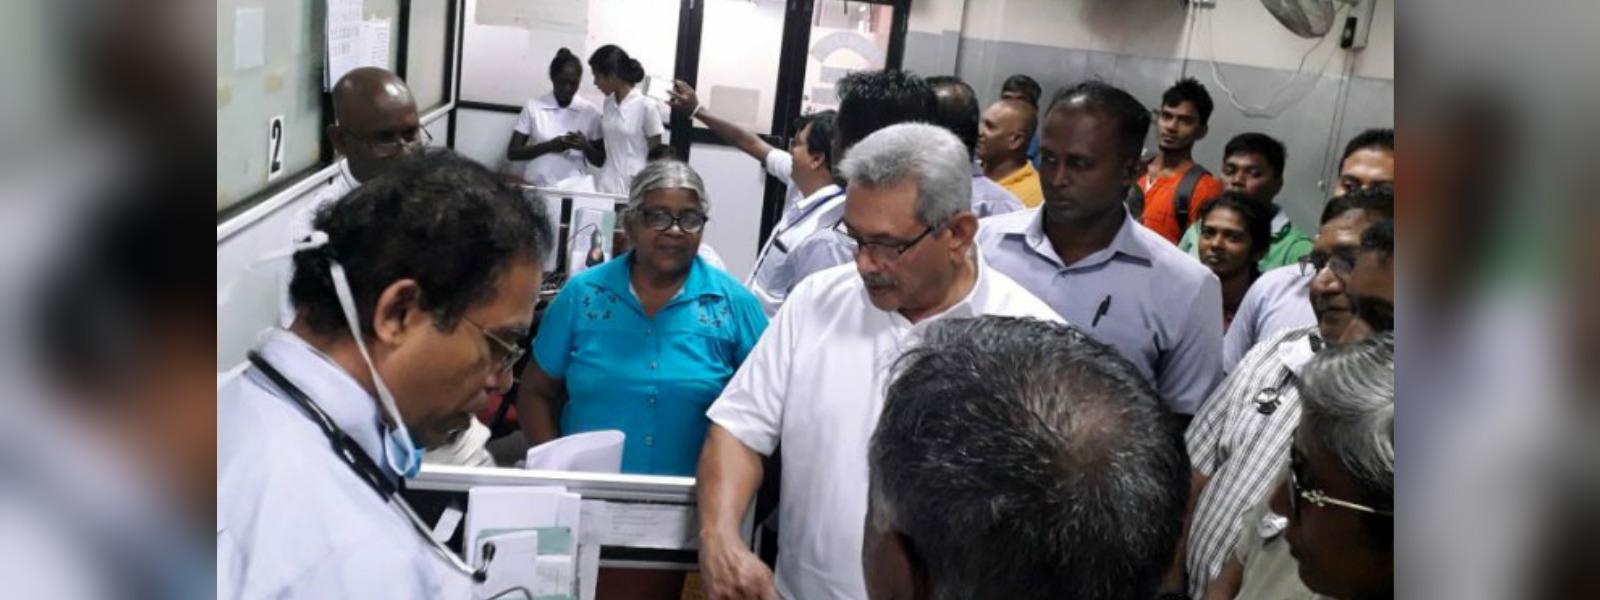 President visits Colombo National Hospital